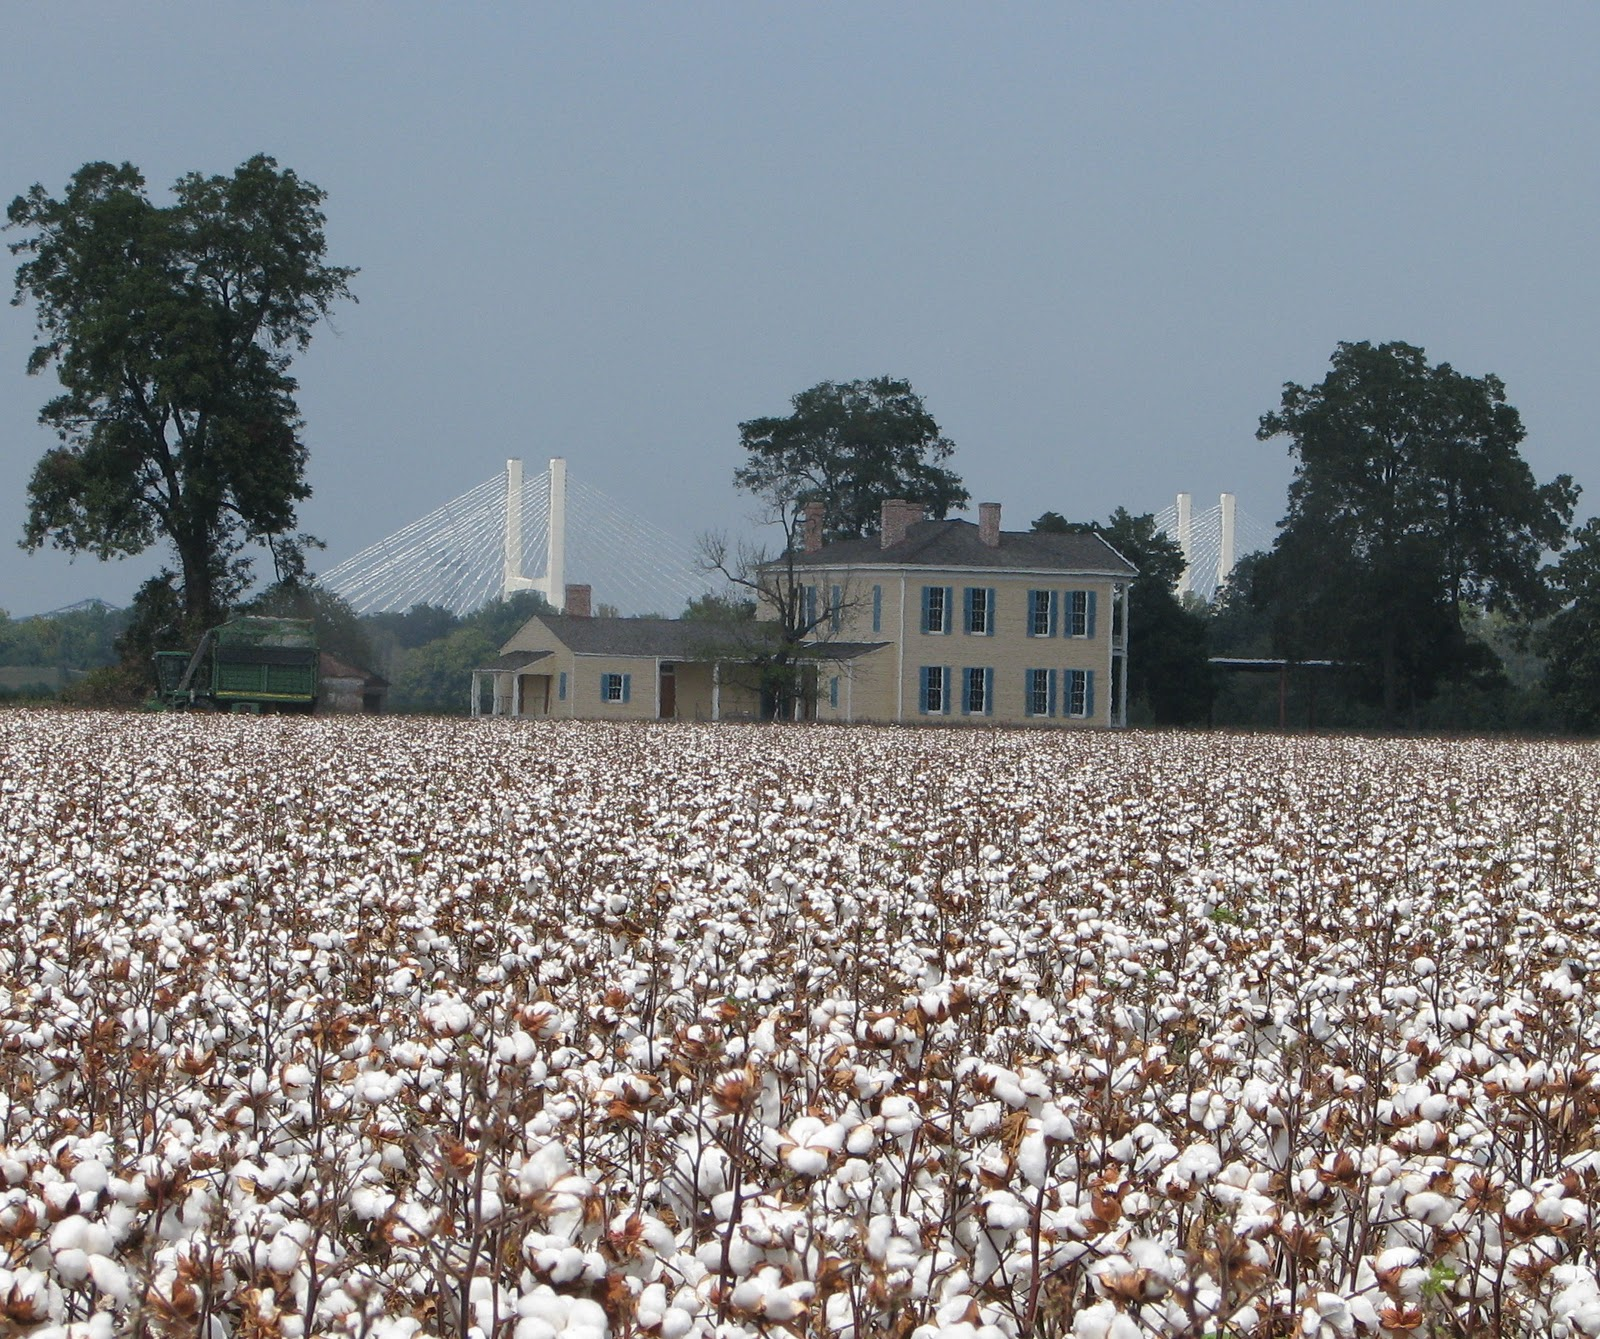 Lakeport Plantation: Another Season of Cotton